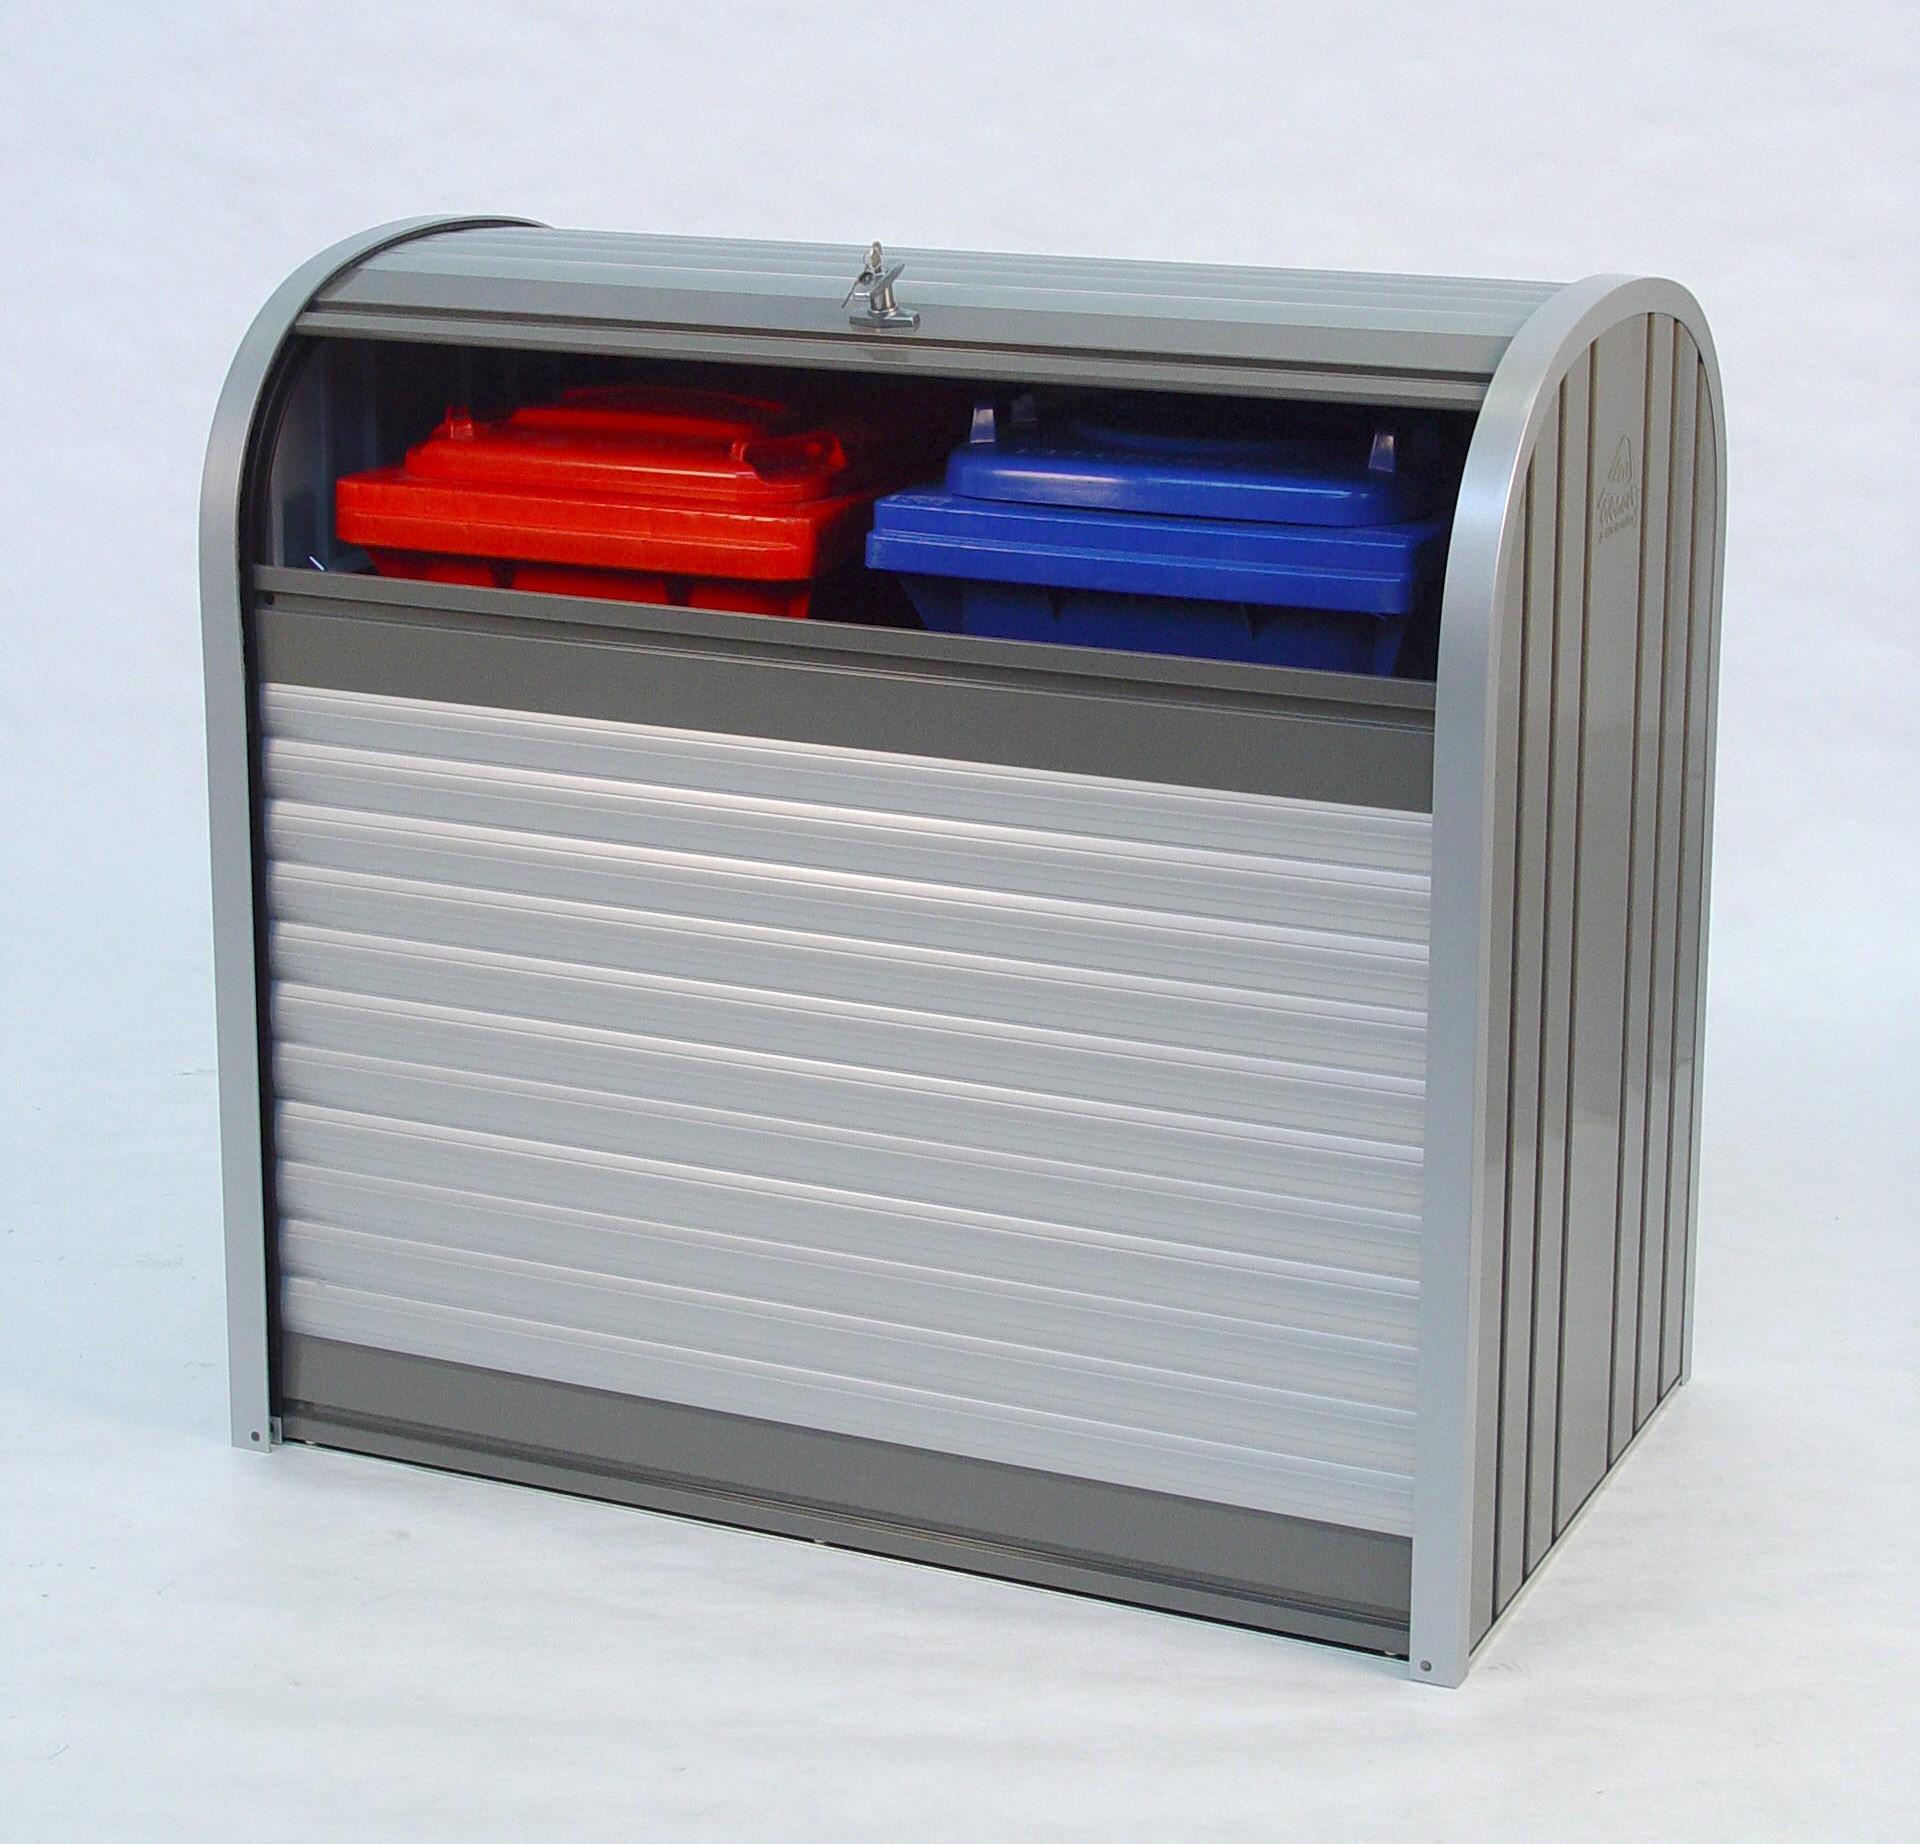 Gartenbox / Auflagenbox Biohort Storemax 120 quarzgrau Bild 4